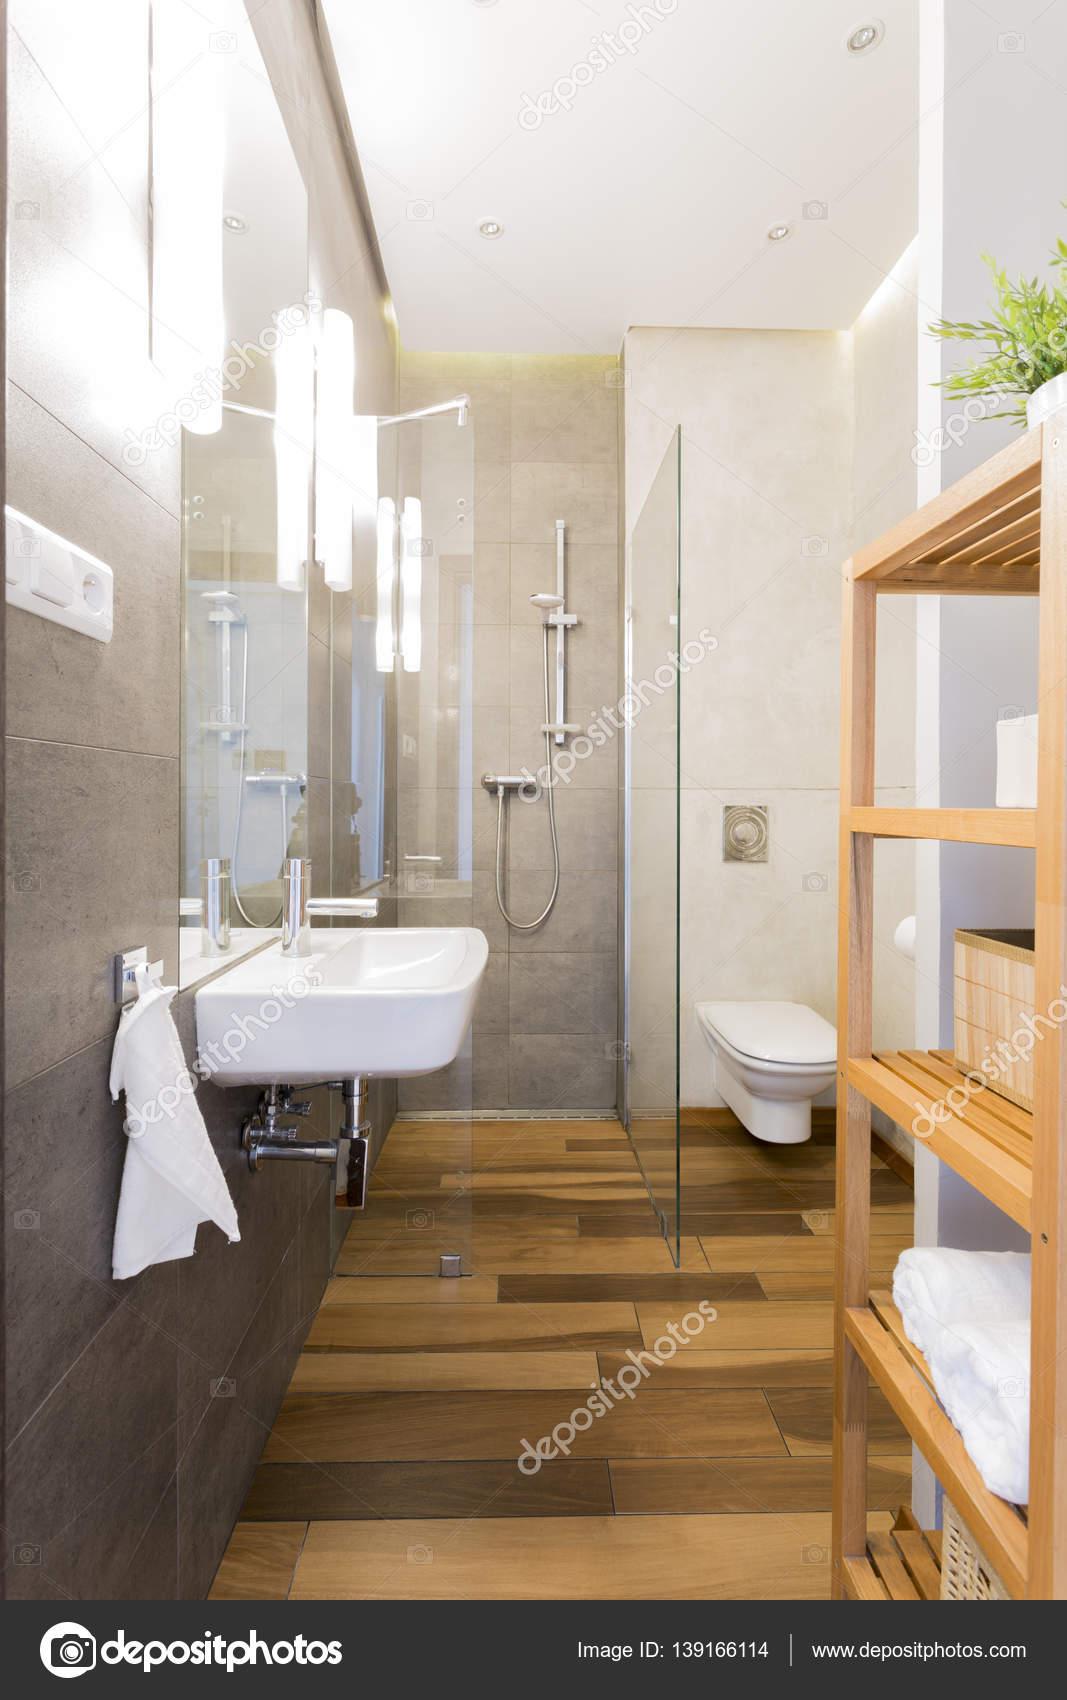 smalle loft badkamer met houten vloer stockfoto